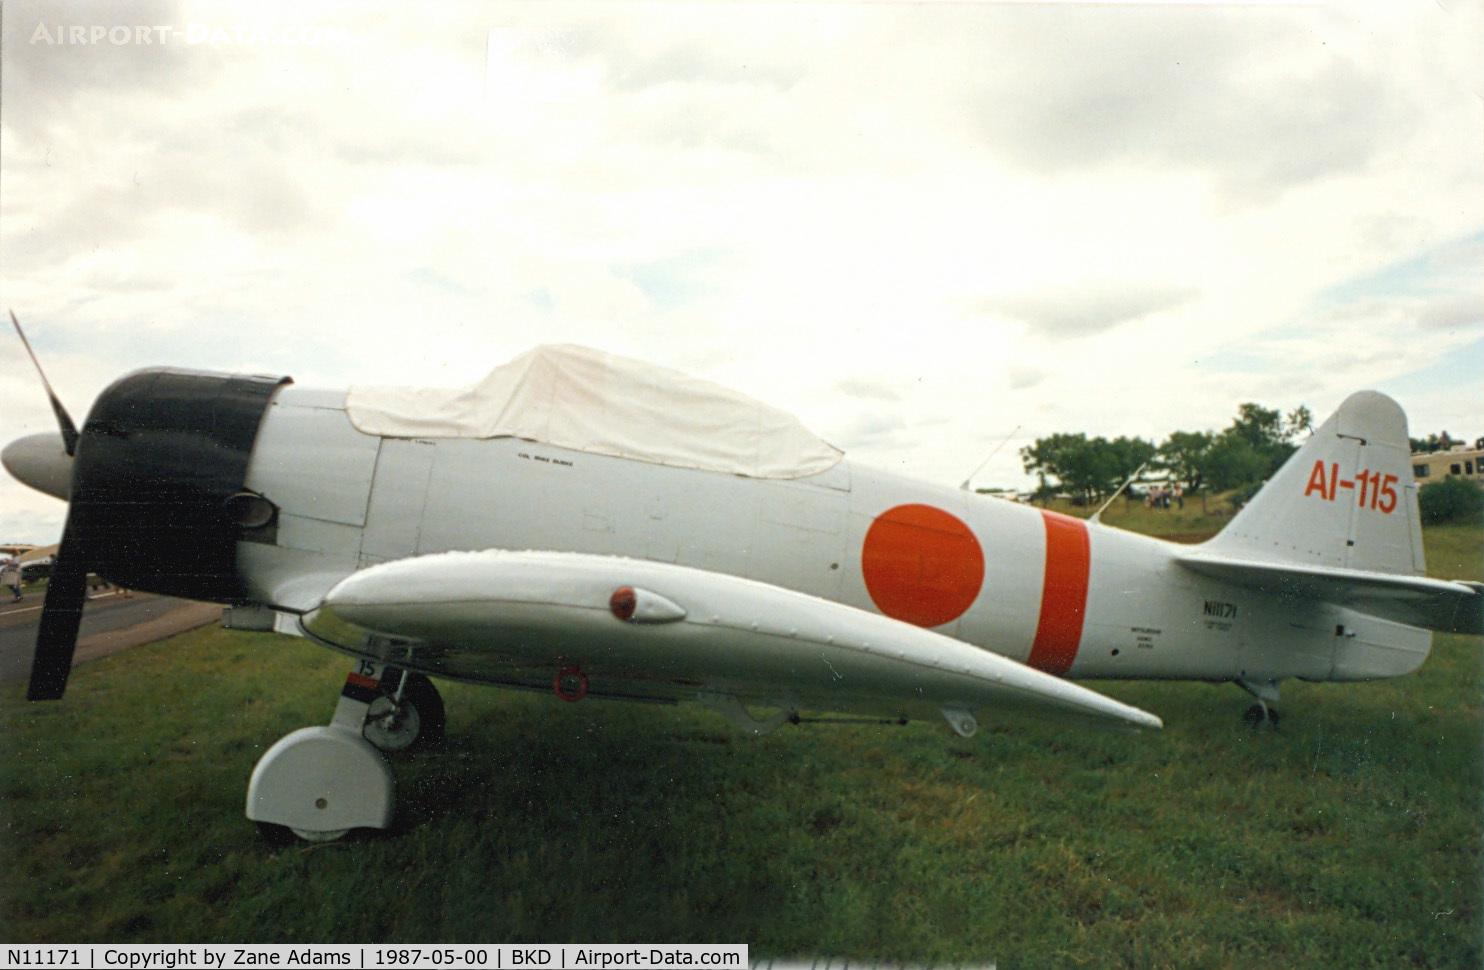 N11171, 1942 North American AT-6B Texan C/N 84-7800, Tora Zero Replica at Breckenridge